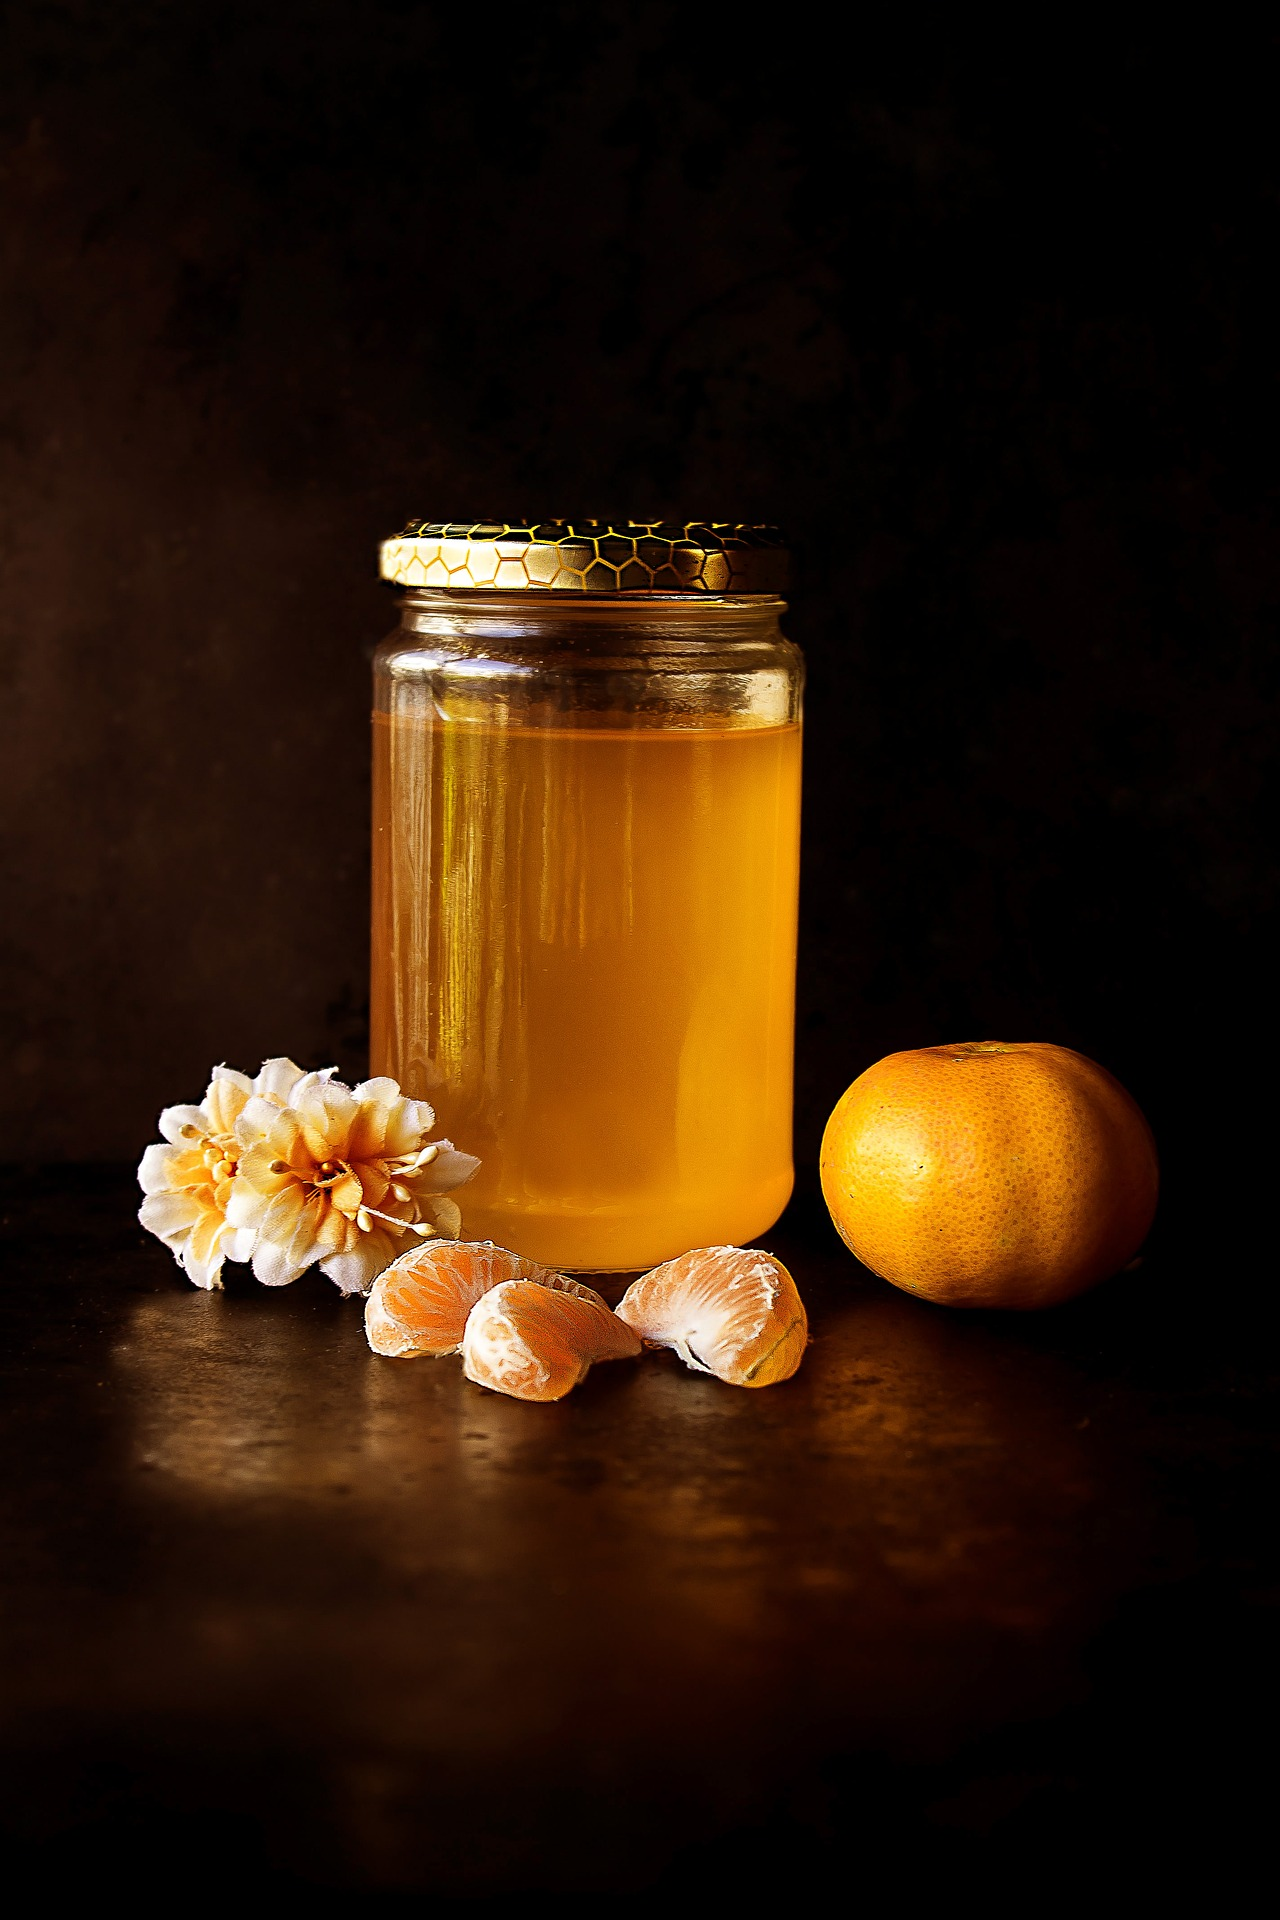 miele in baratolo